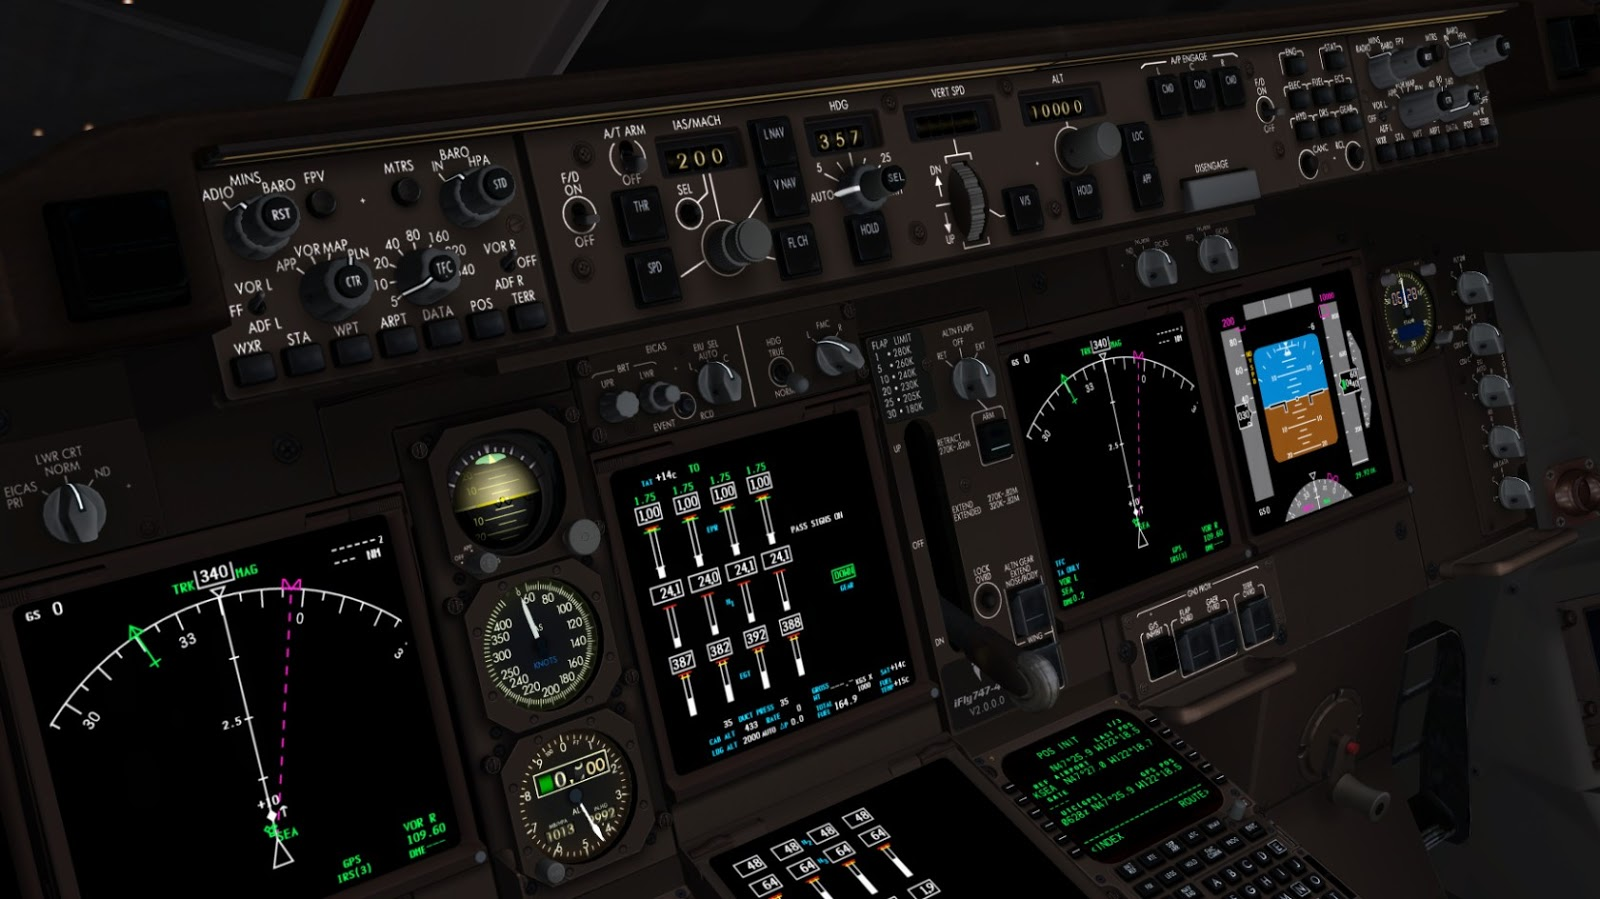 Ifly Boeing 747 400 Fs9 Ariel Creation Auto Electrical Wiring Diagram